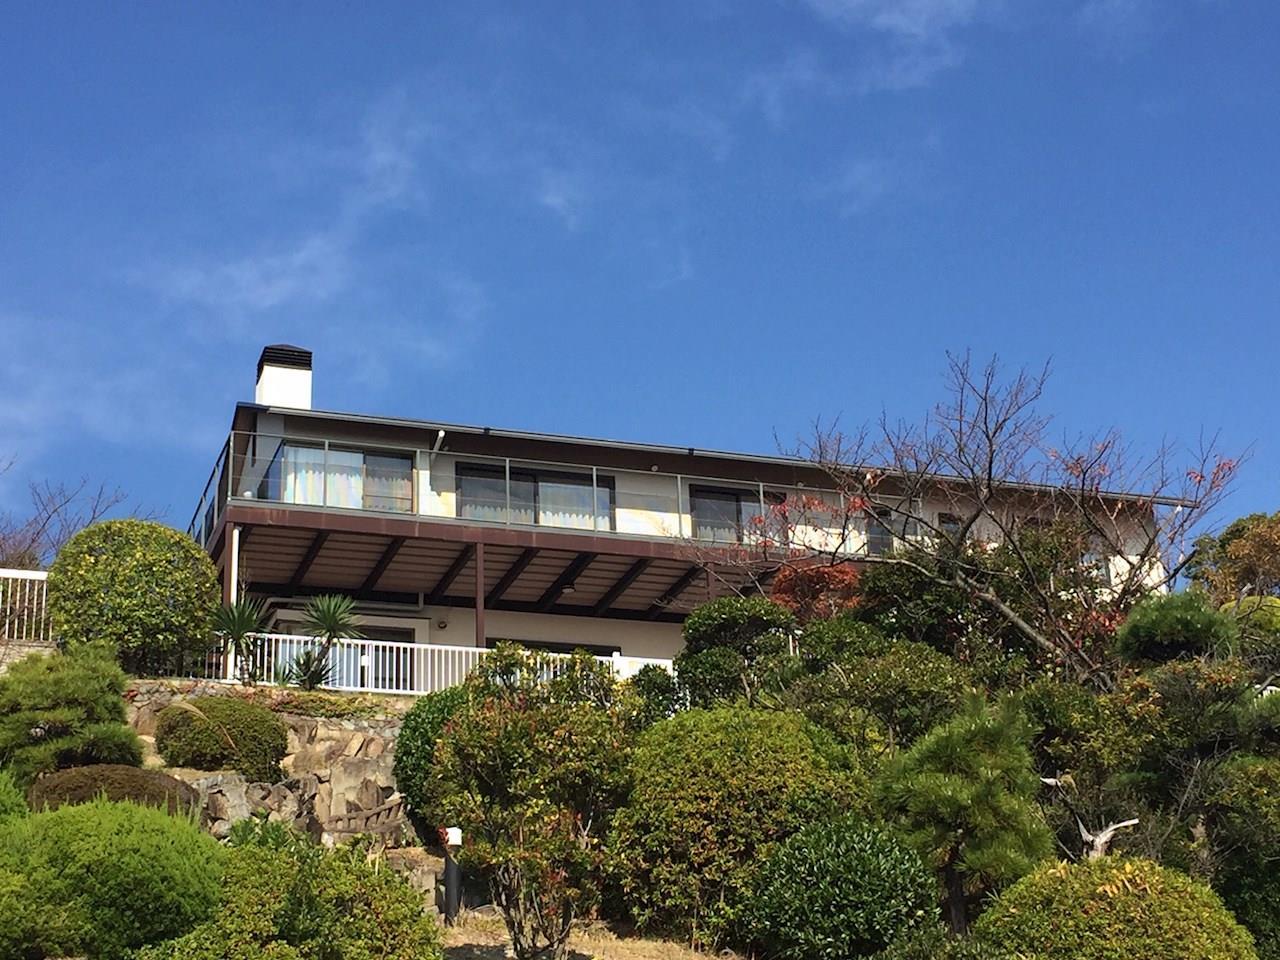 Shioya Expats House 50